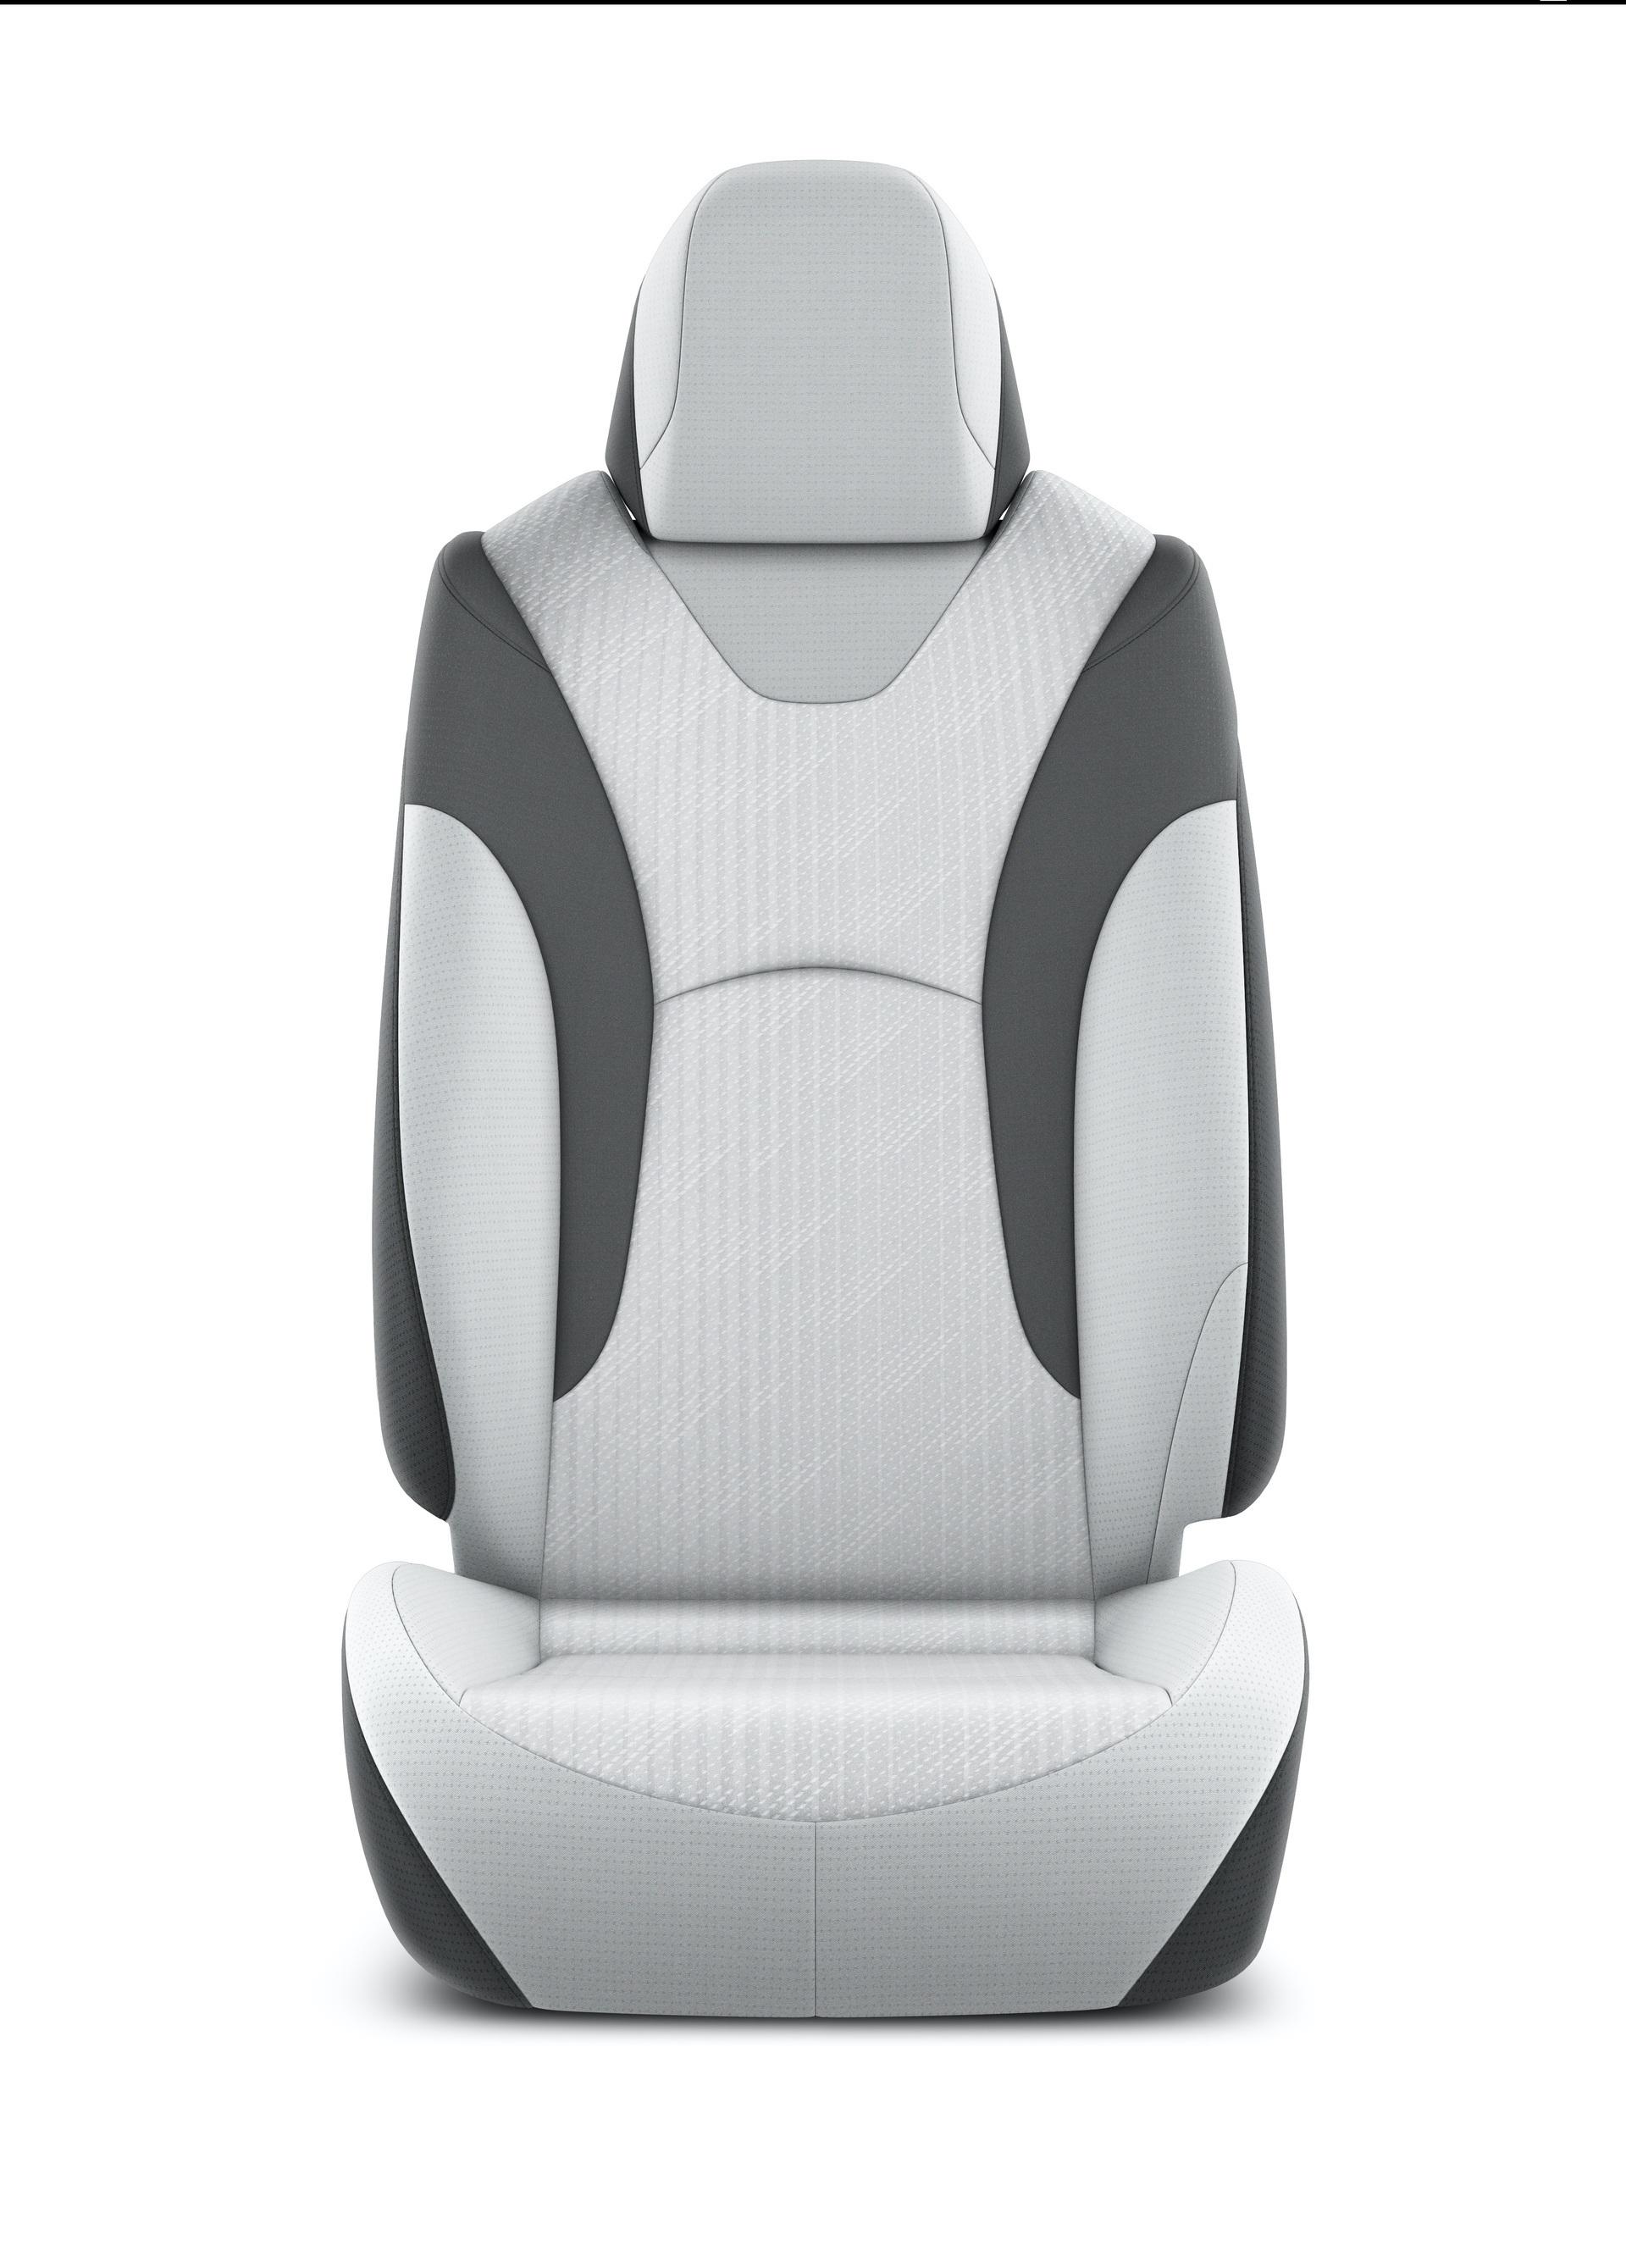 2019_Toyota_Prius_Plug-in_Hybrid_0008